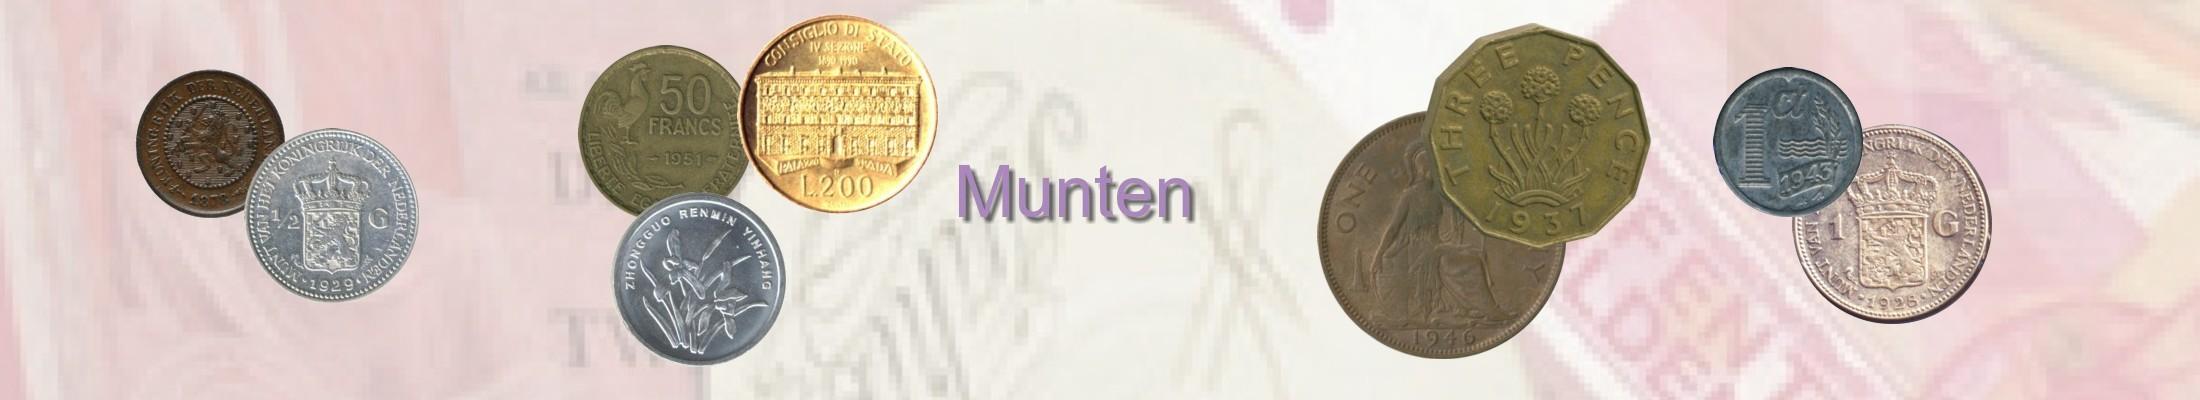 Munten